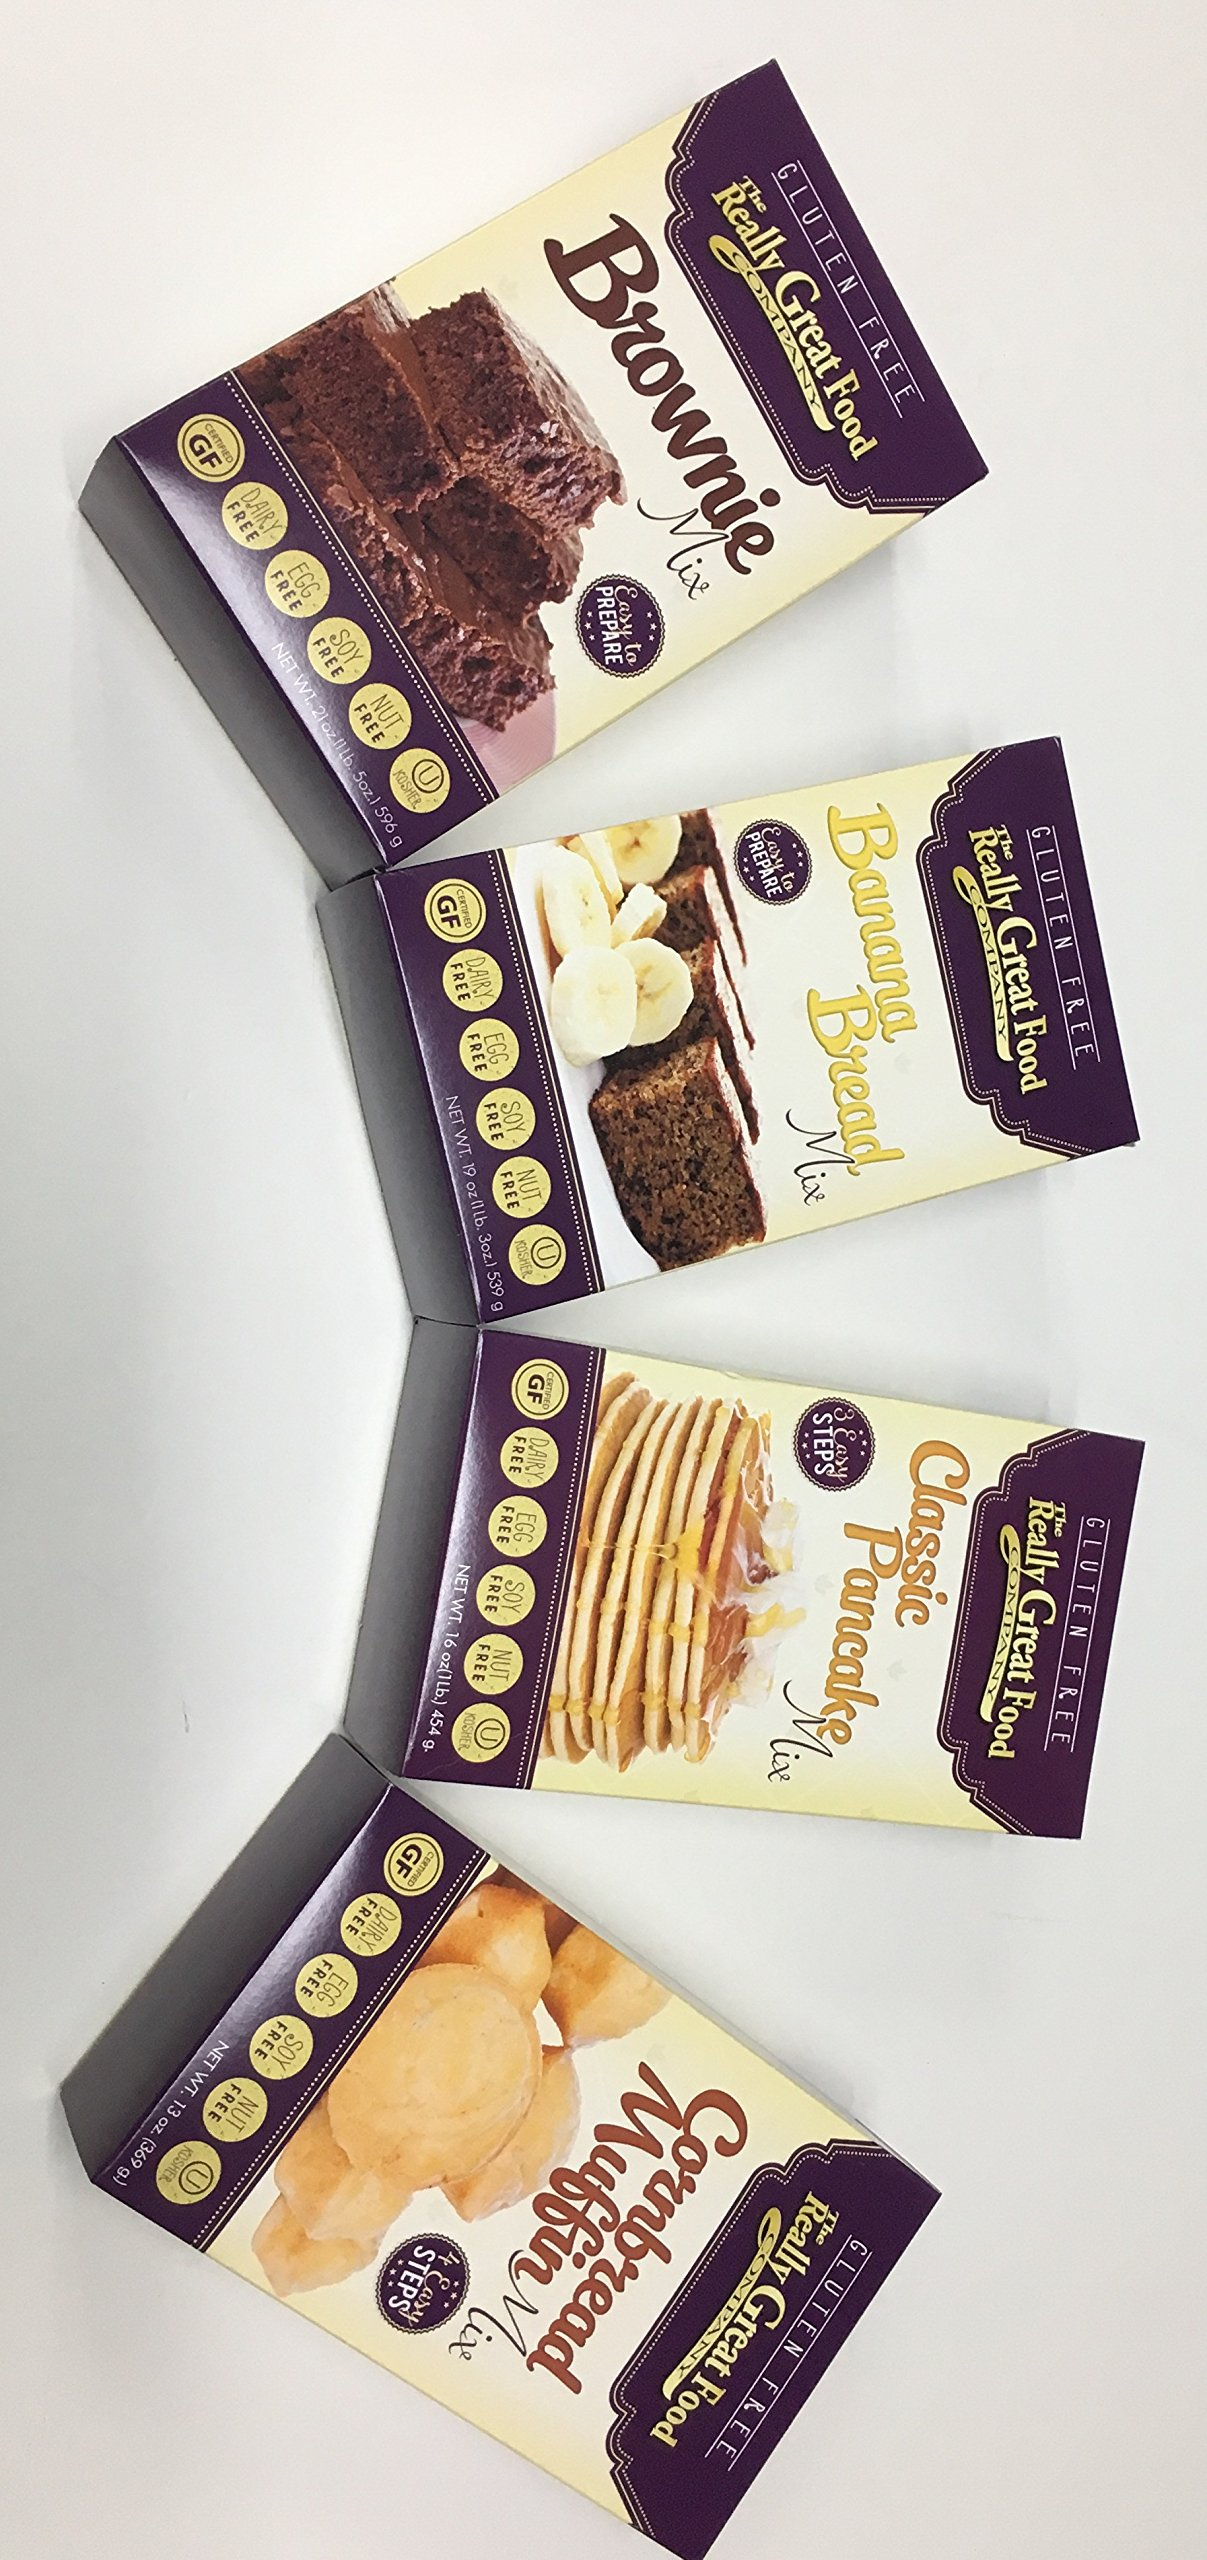 The Really Great Food Company GLUTEN FREE Baking Mixes 4 PACK (Brownie, Banana , Pancake & Cornbread) by The Really Great Food Company Baking